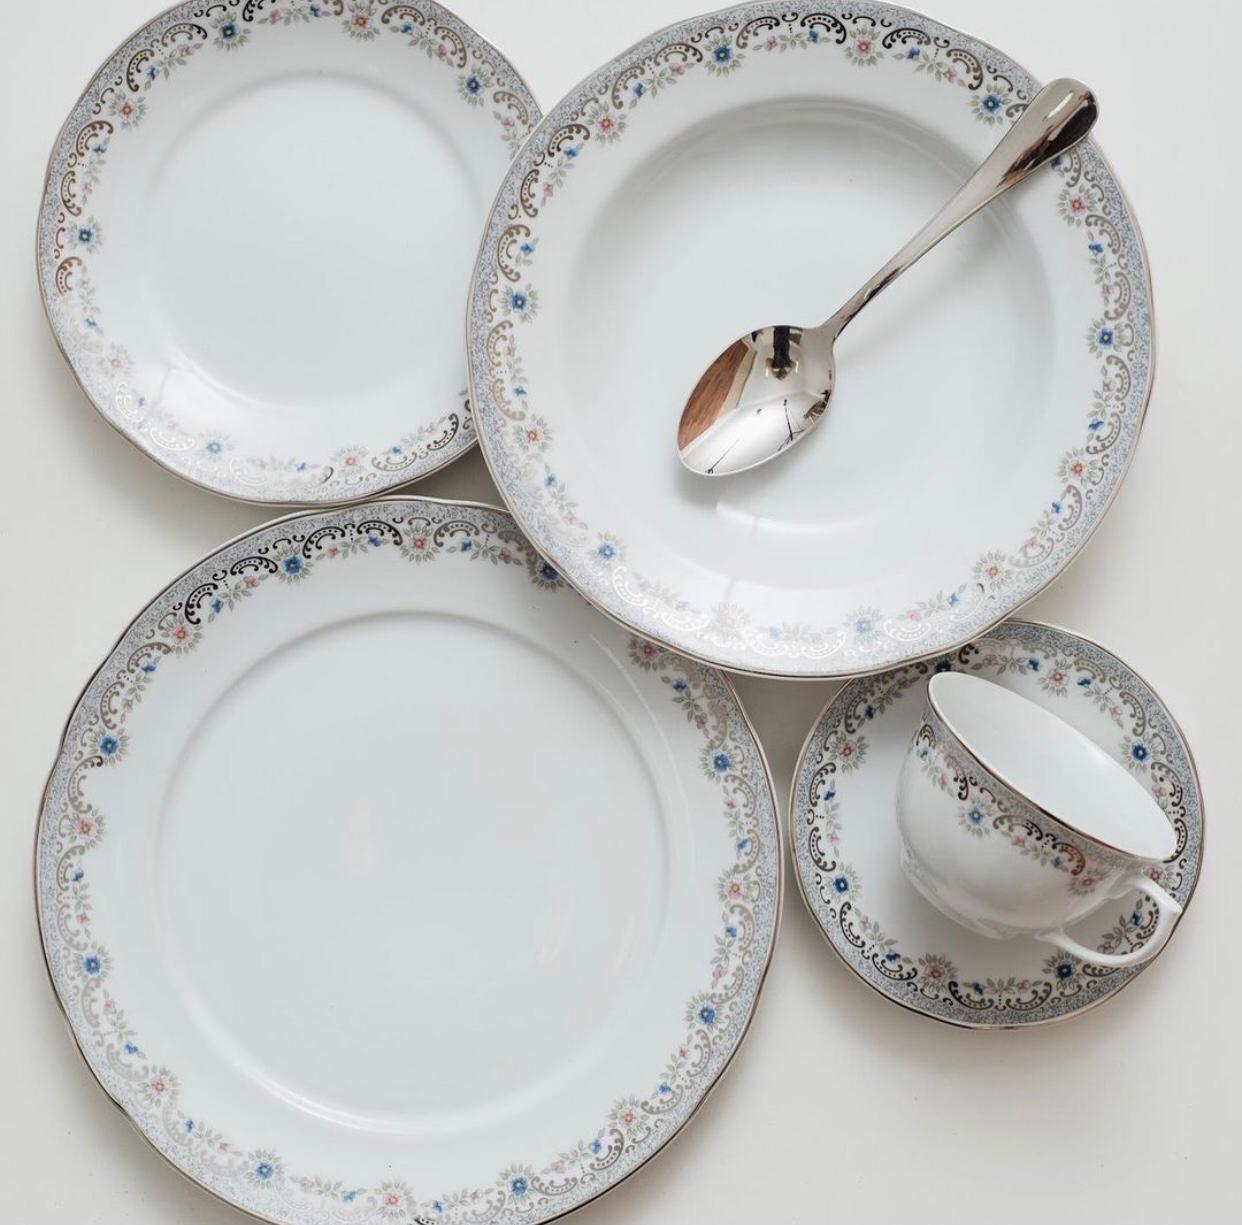 Aparelho De Jantar 30 Peças Saint Germain Schmidt